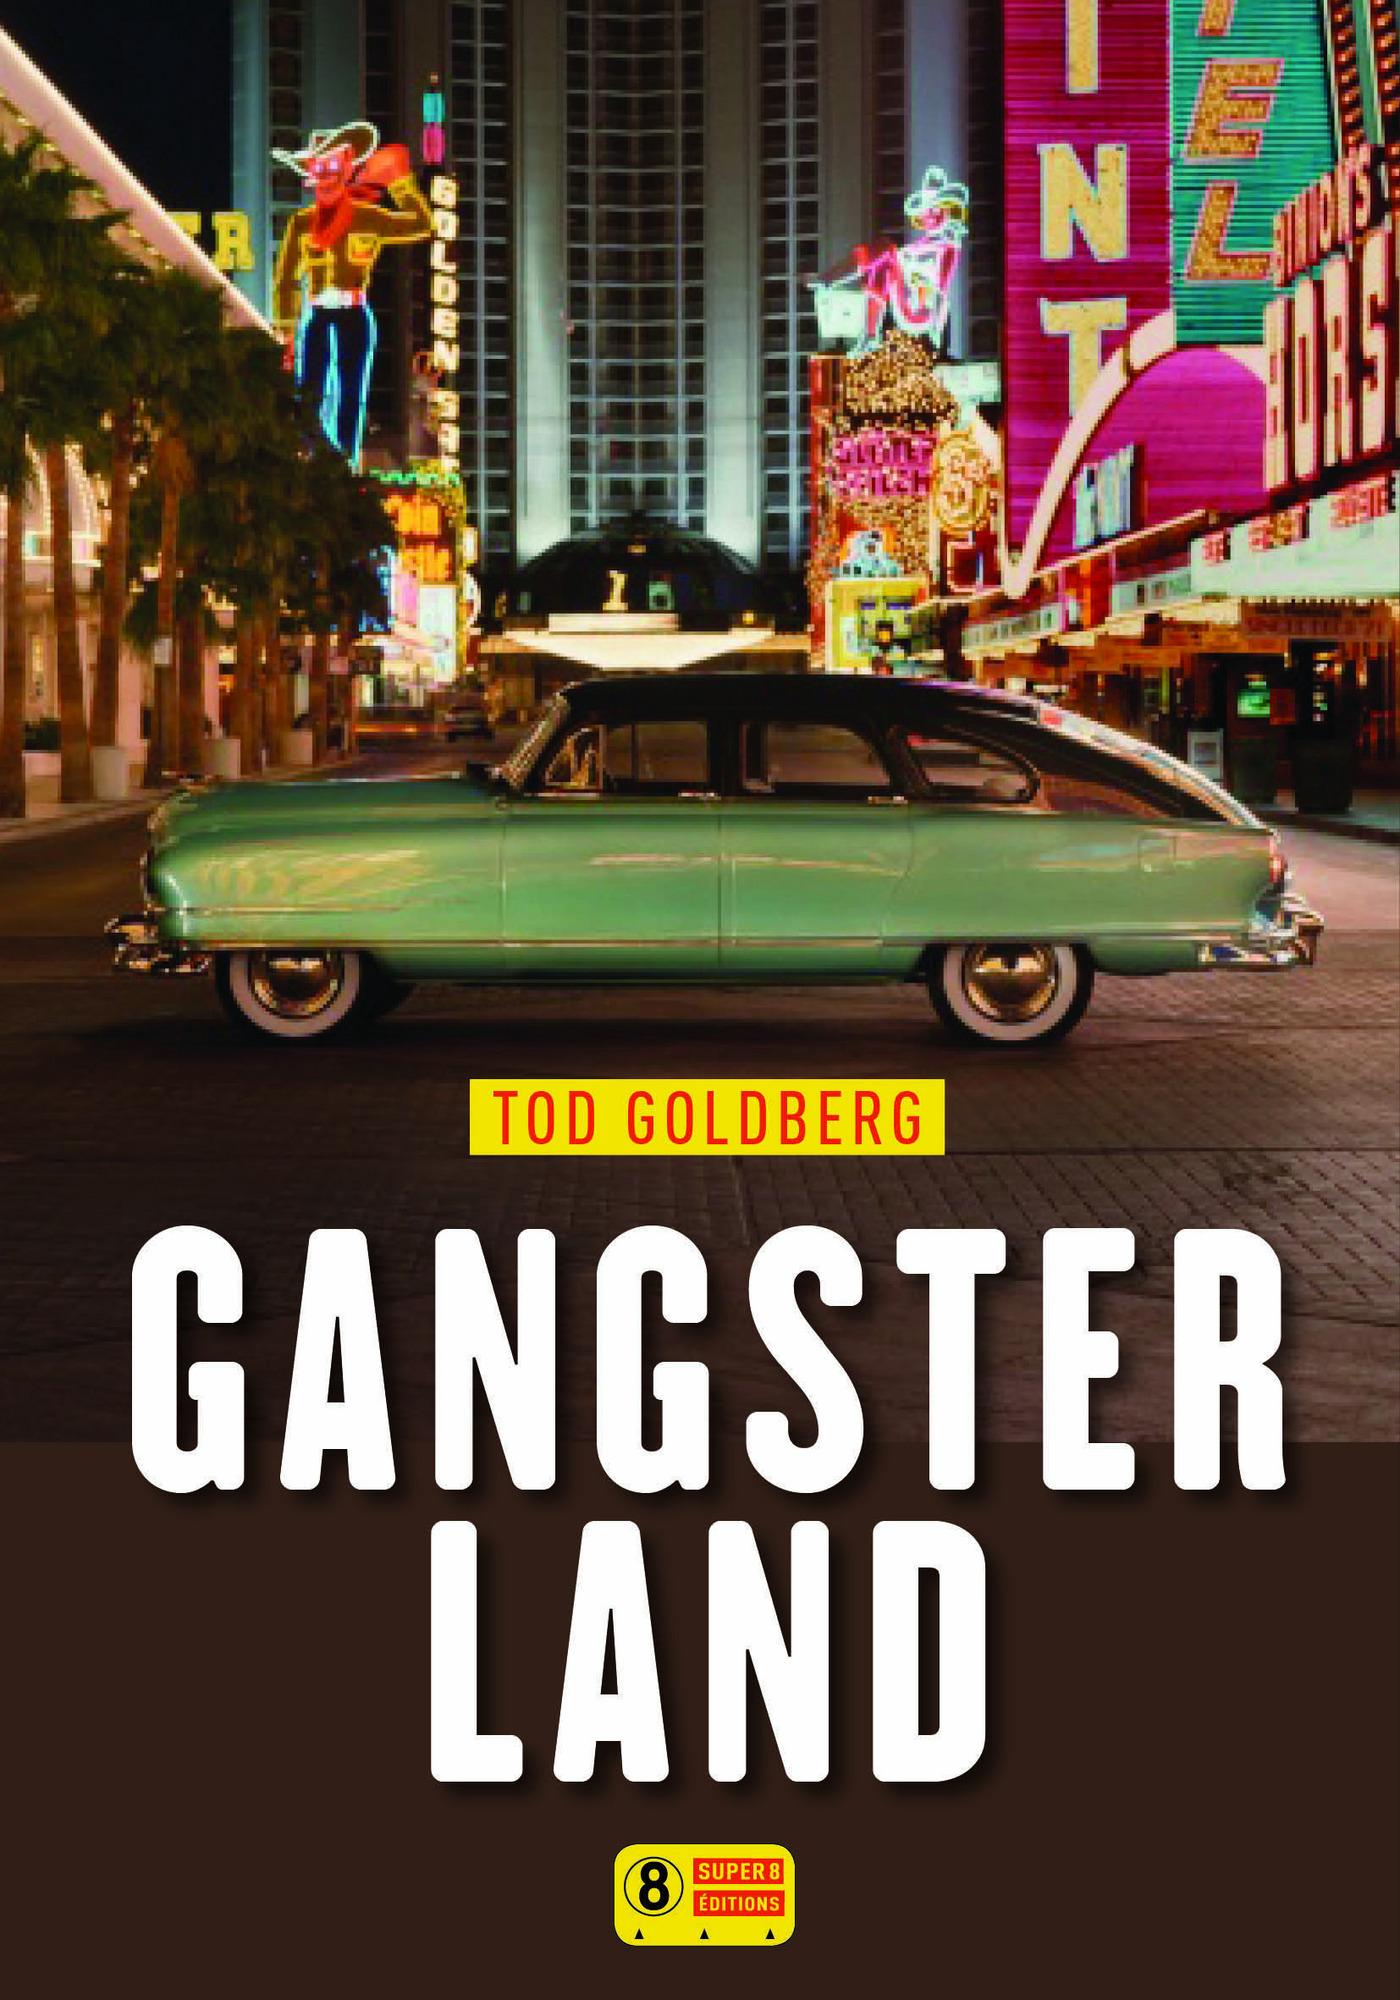 Gangsterland